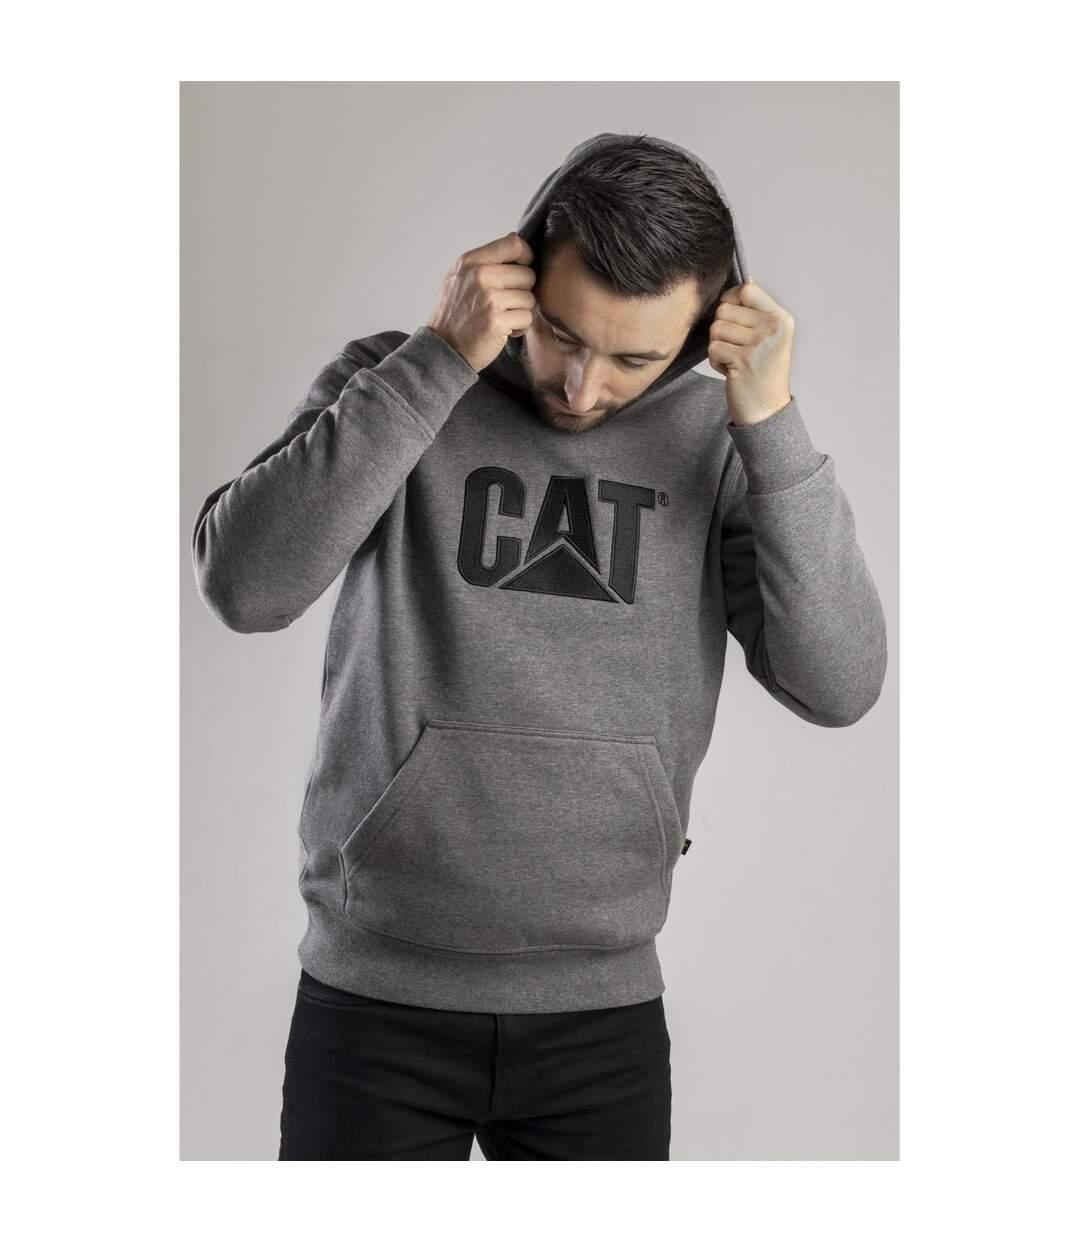 Caterpillar CW10646  - Sweatshirt à capuche - Homme (Gris) - UTFS813